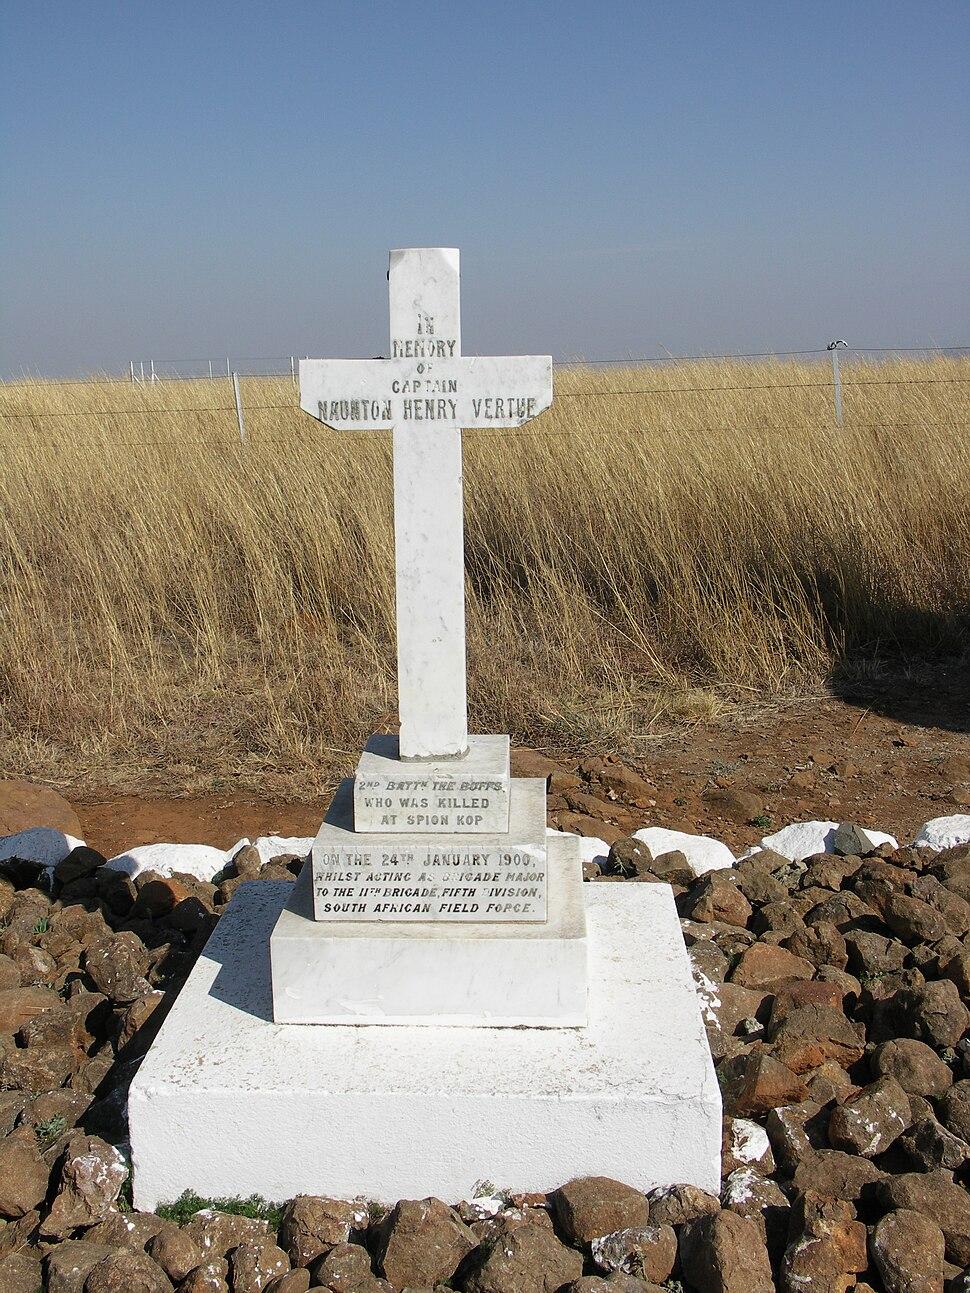 Memorial-Naunton Henry Vertue-001